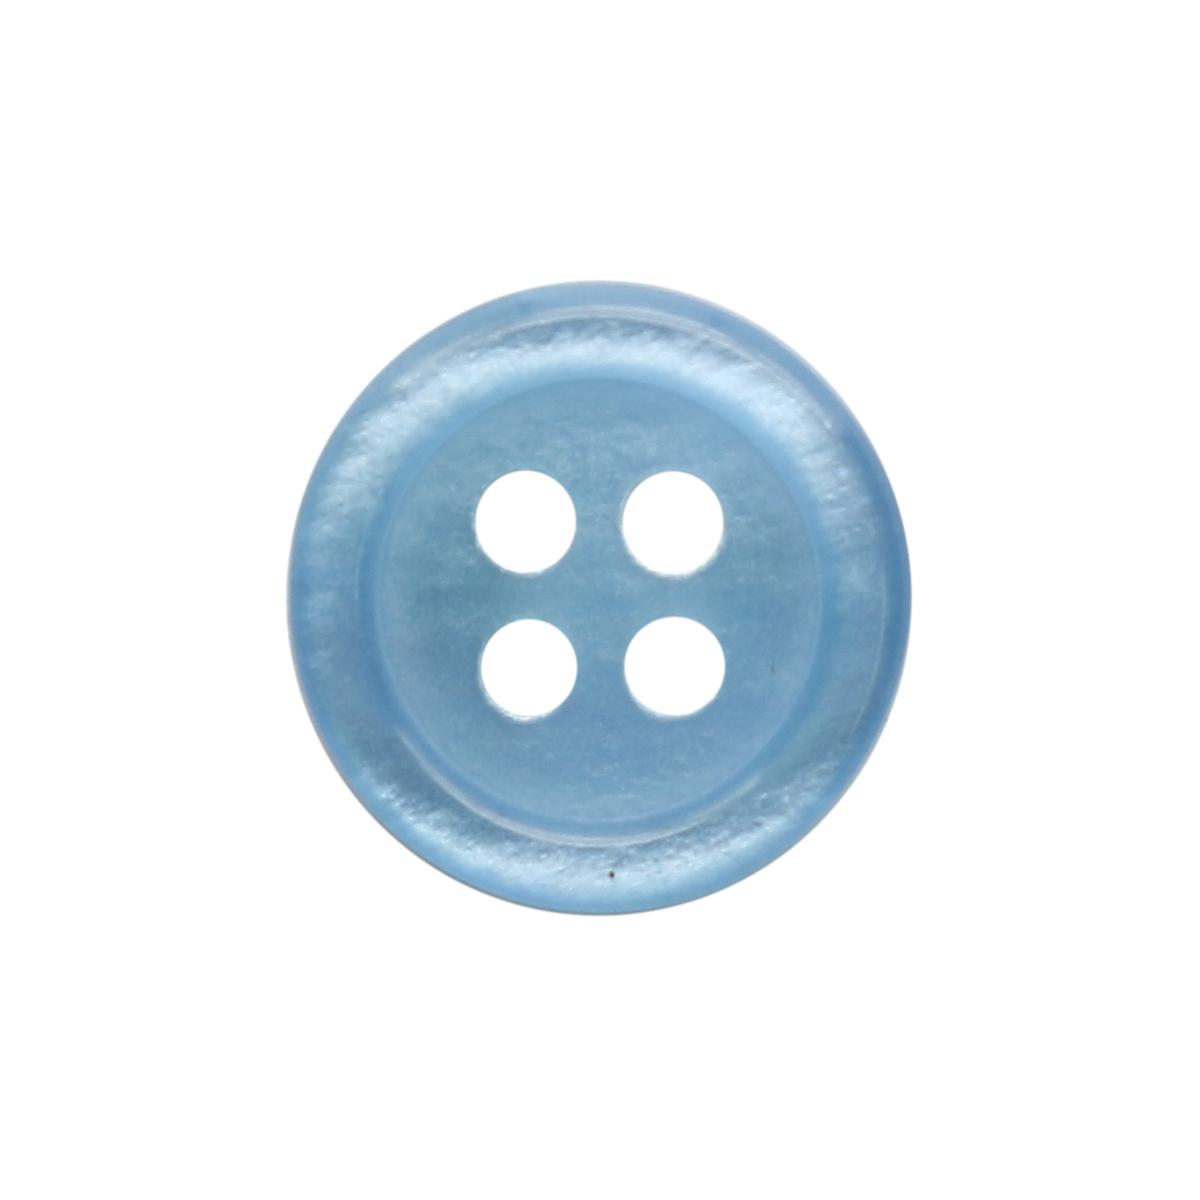 35483/4 18 (3578) Пуговица 4прокола голуб.полиэстер ГР